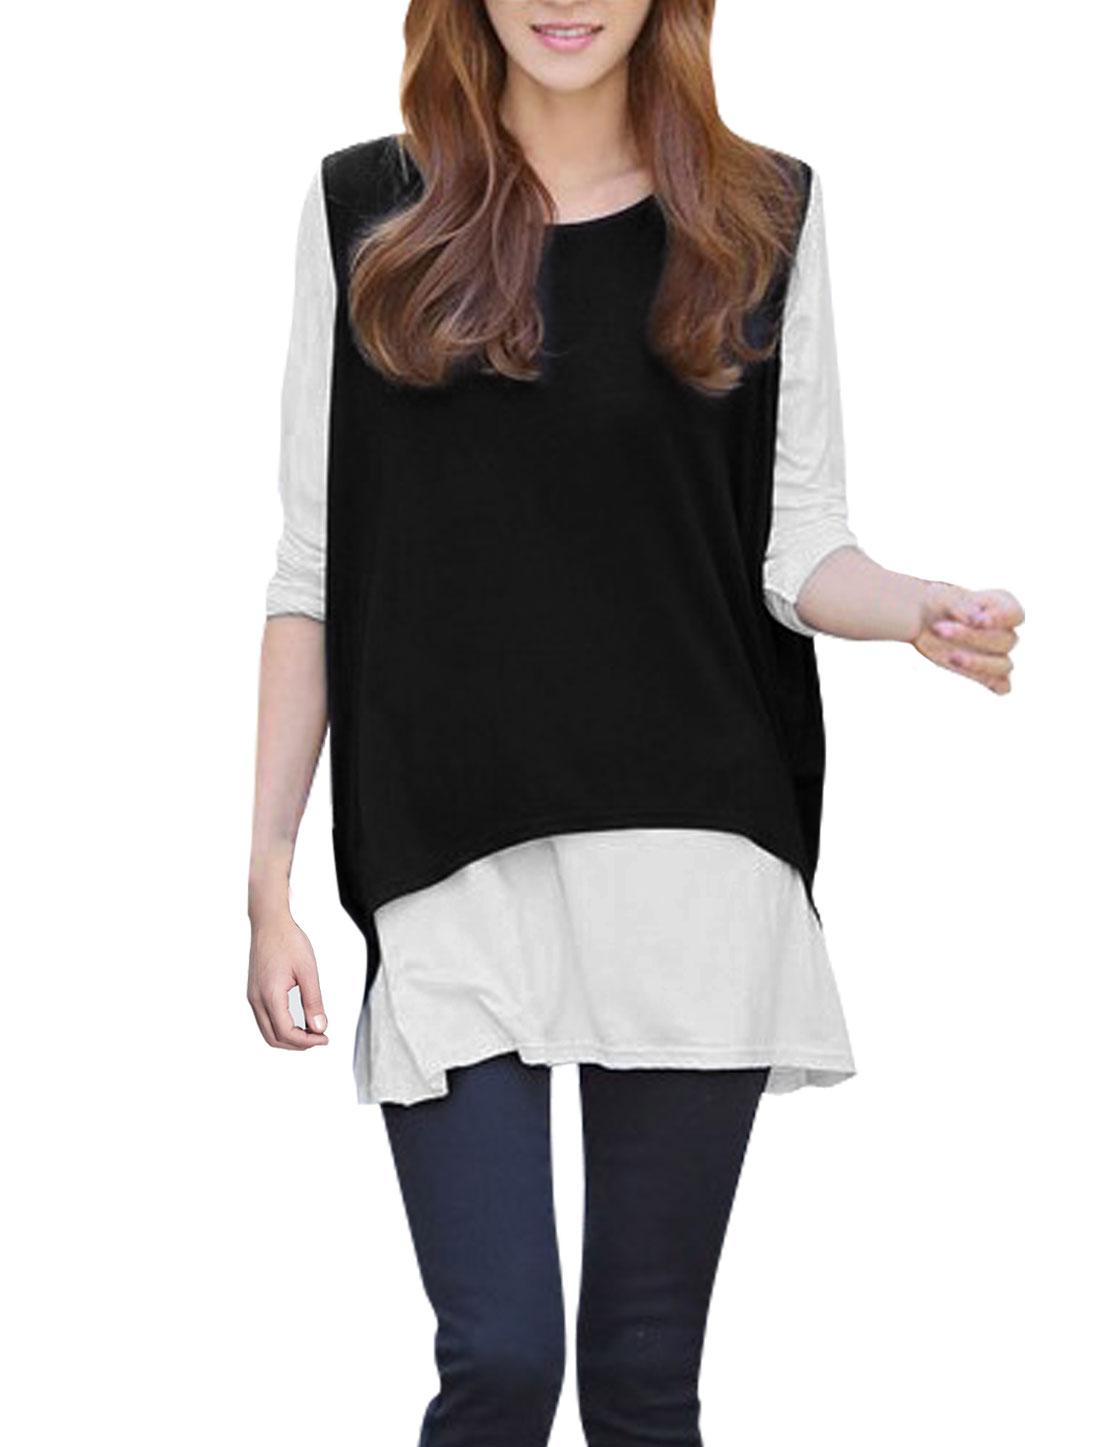 Women Scoop Neck Layered Shirts Loose Black White Tunic Tee Shirt S